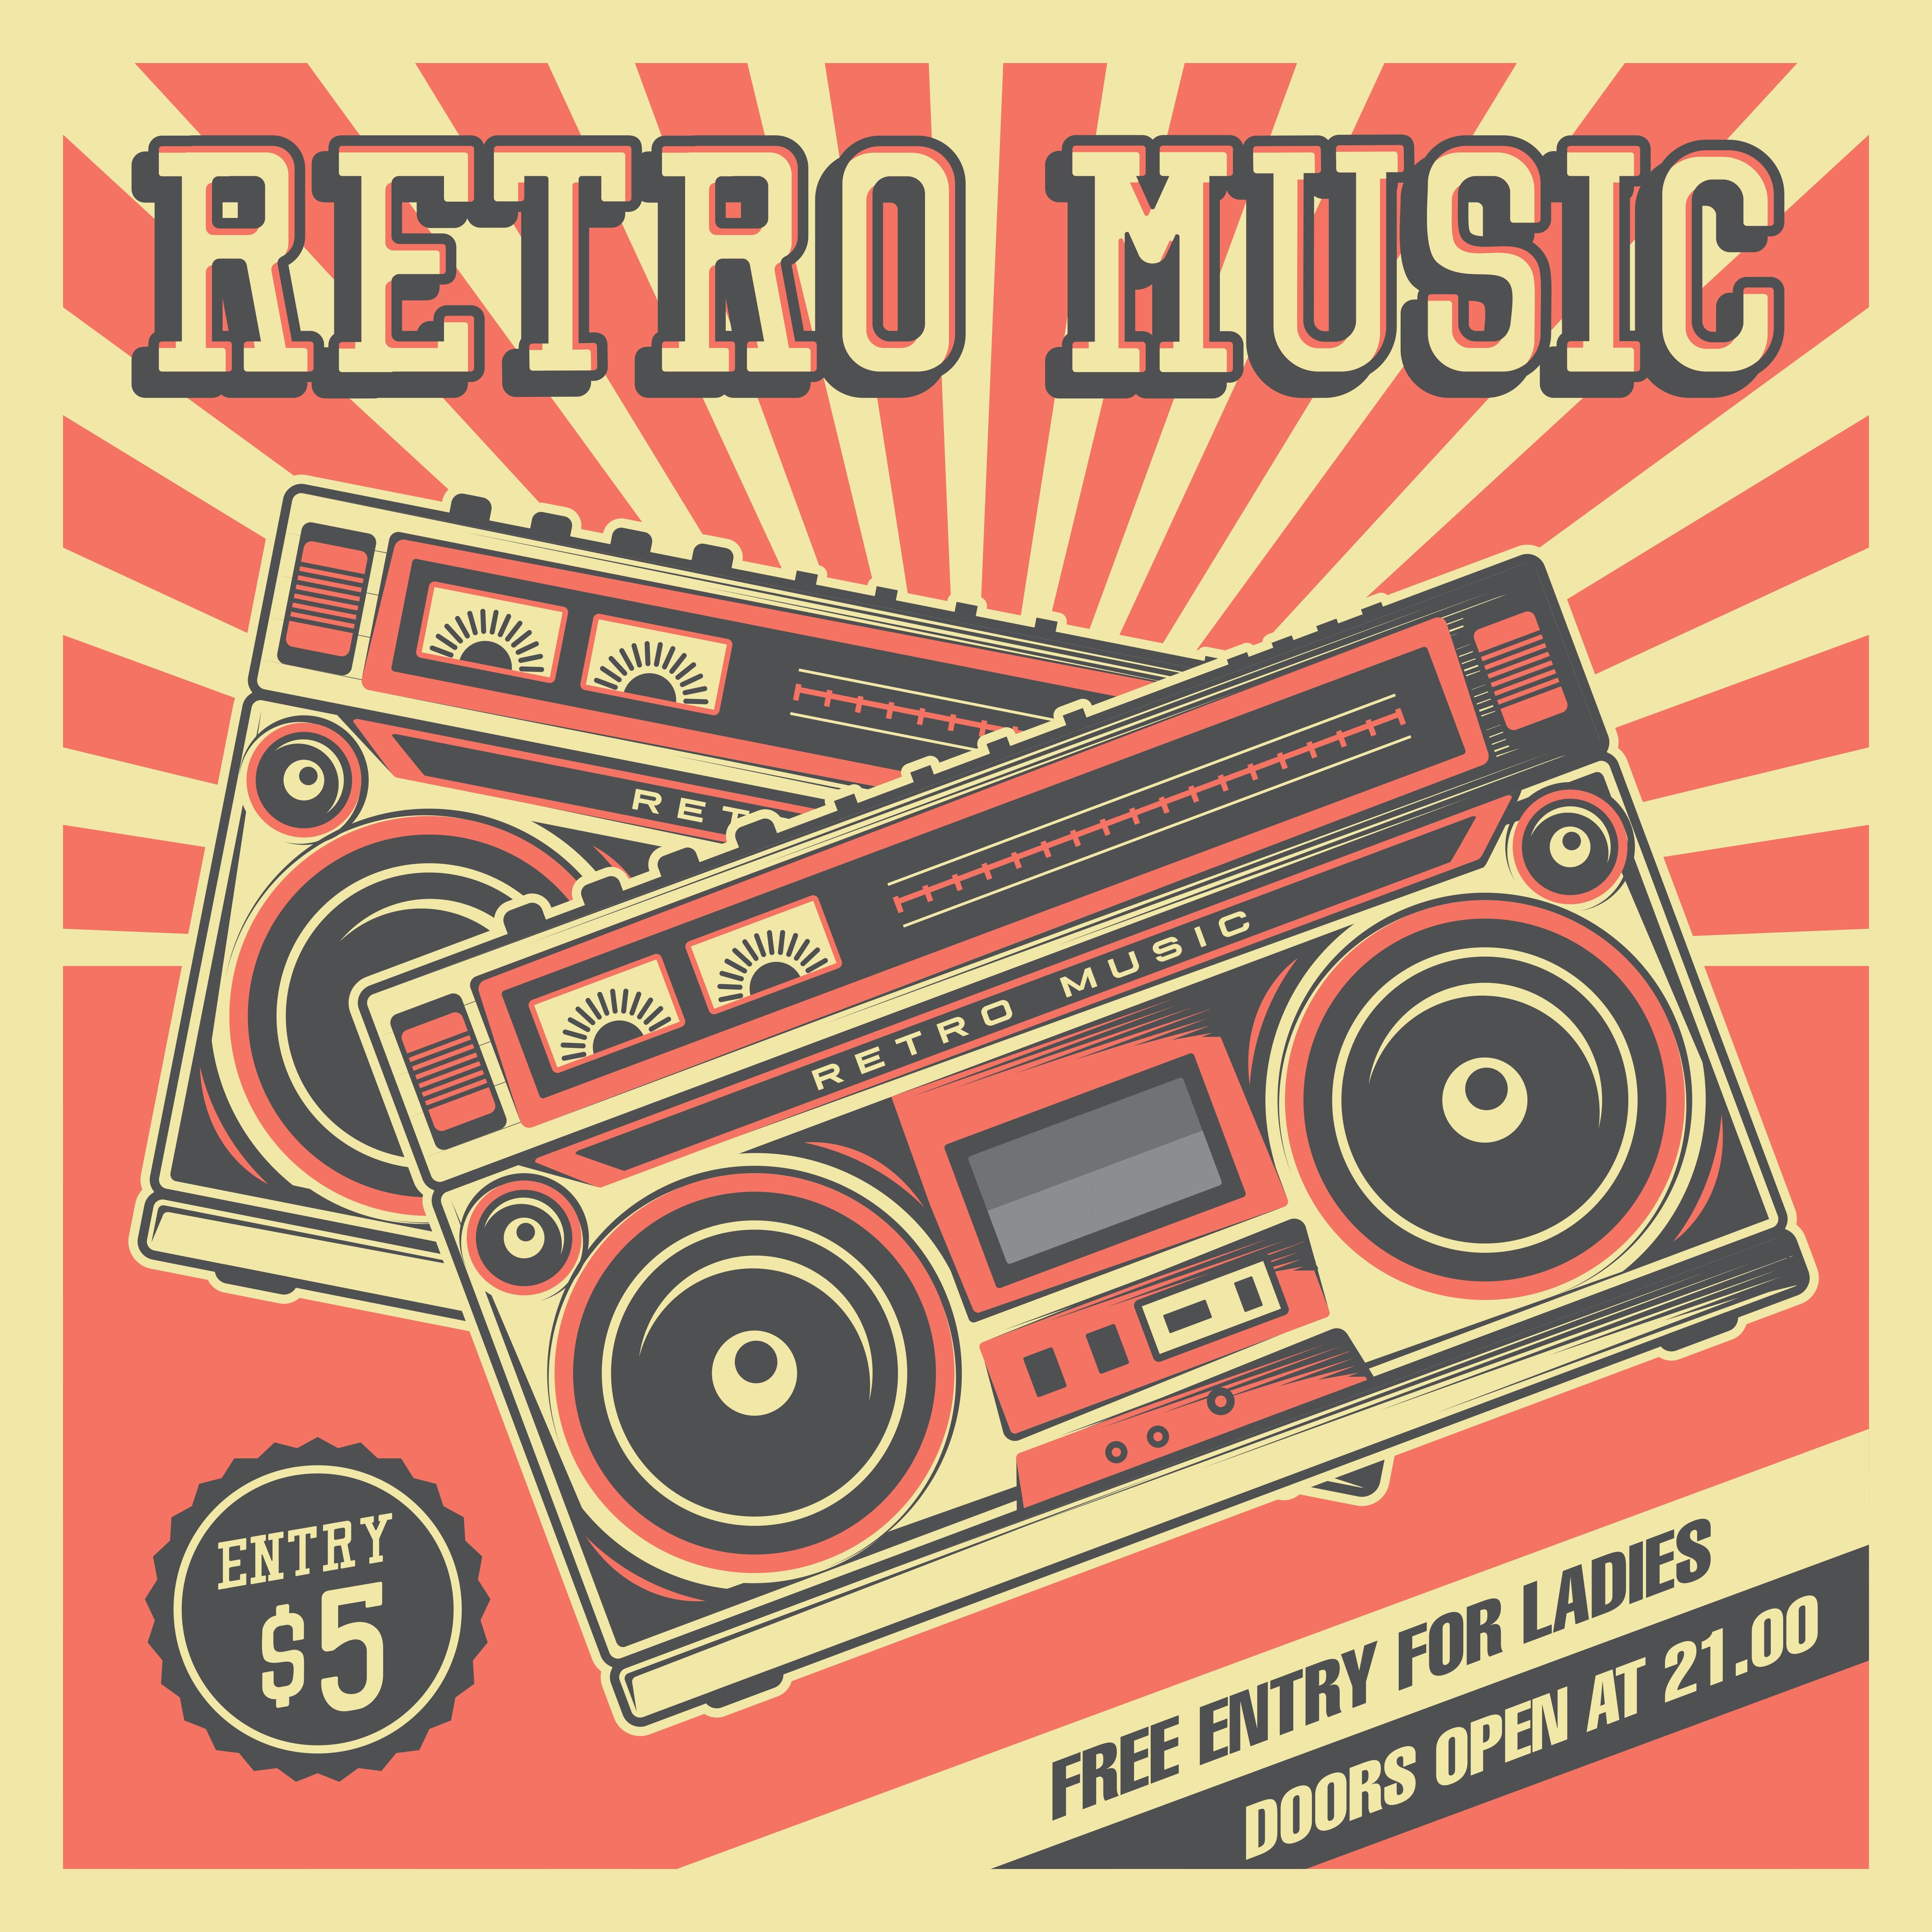 Retro Music Tape Recorder Vintage Signage - Download Free ...